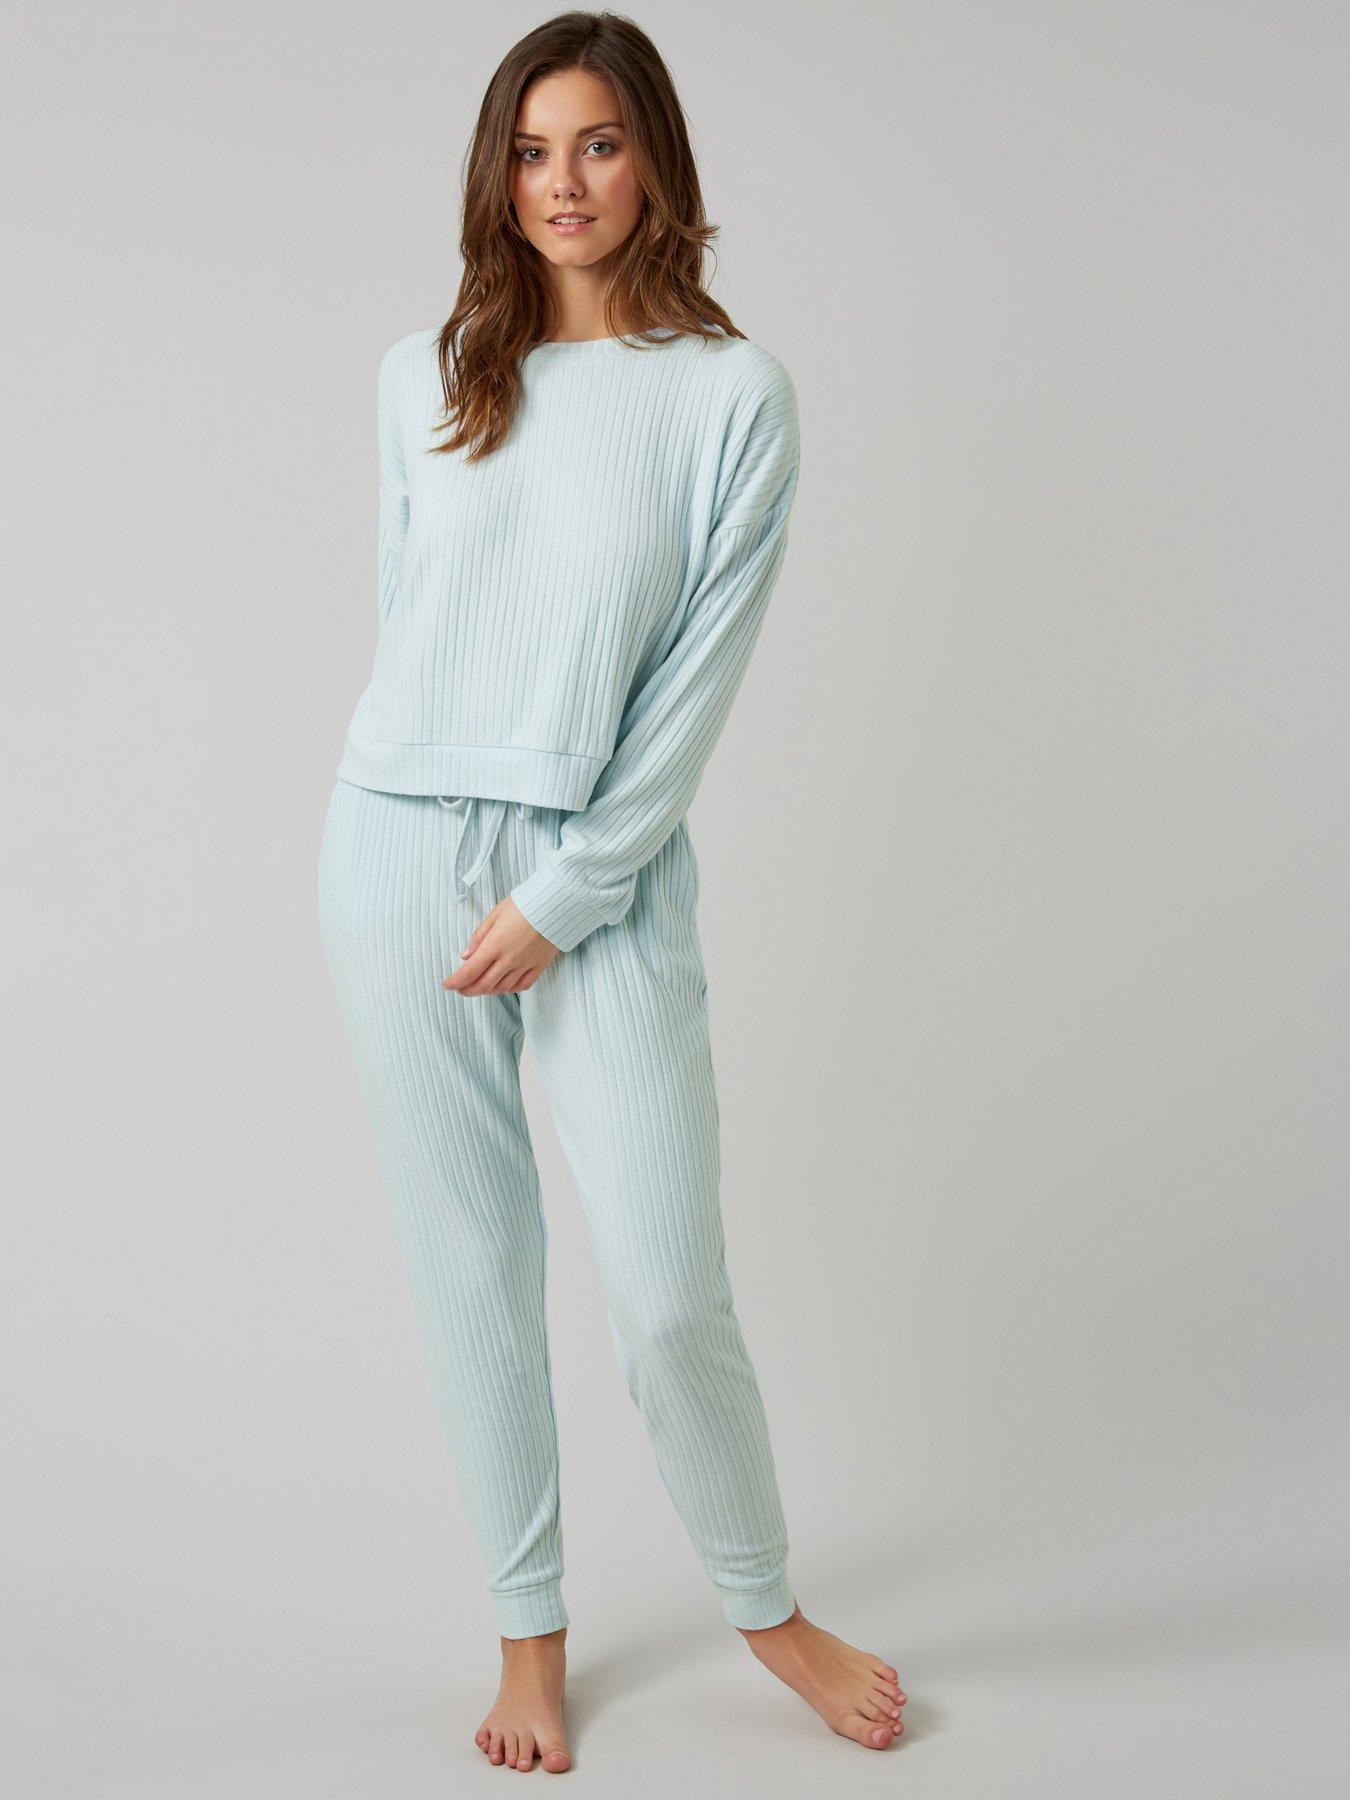 Ann Summers Pyjamas Rabbit PJs Set Nightwear Pajama Joggers Loungewear WAS £30